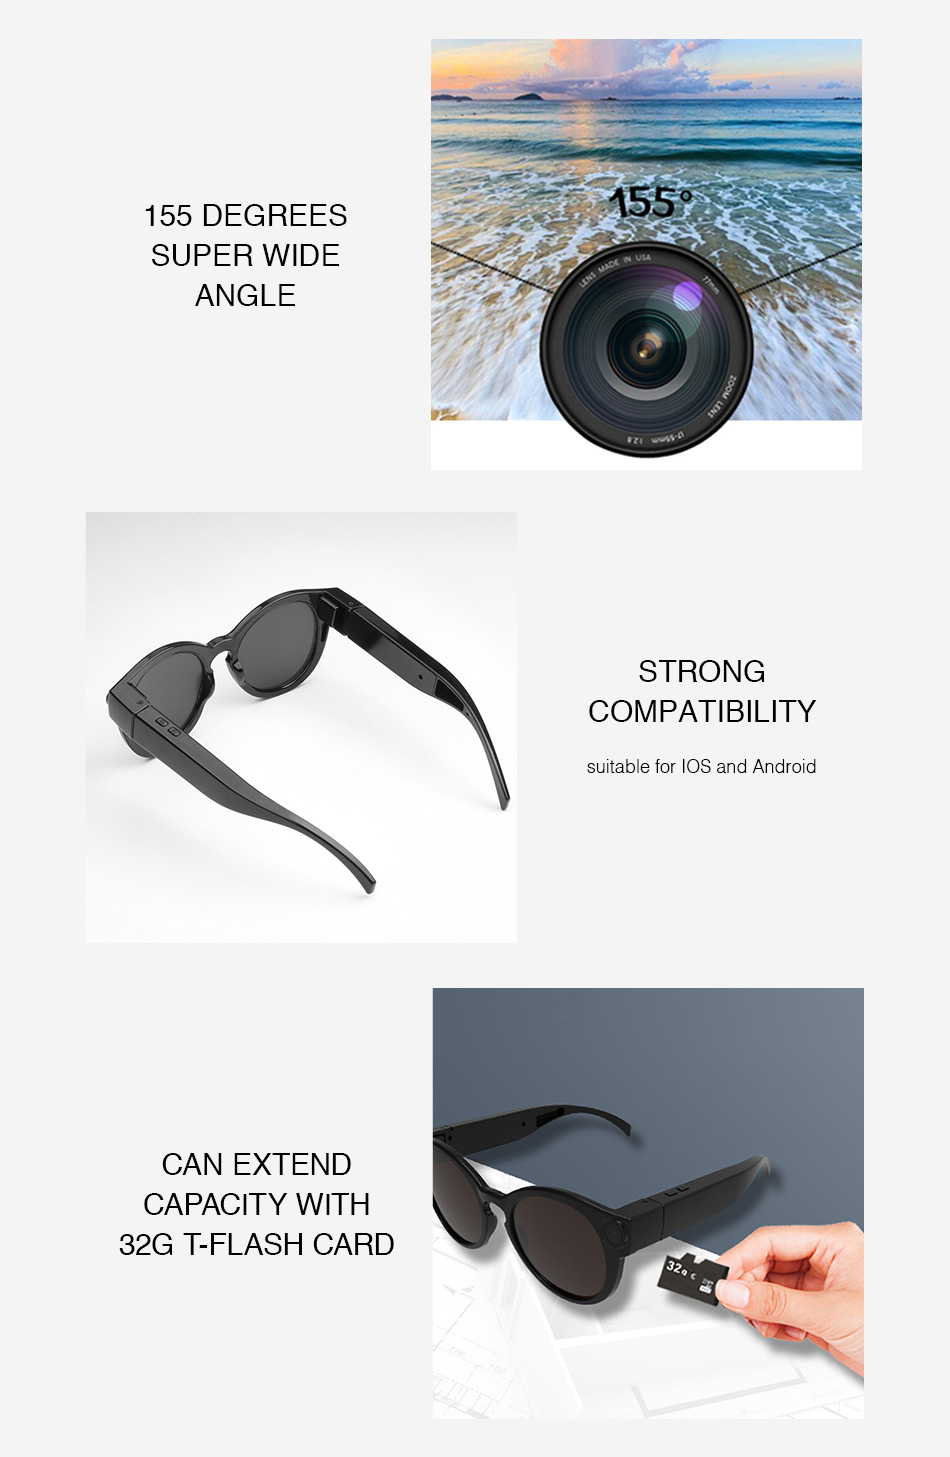 a11a3430f99d2 ET Digital Wifi Camera Sunglasses HD Glasses Eyewear DVR Video Recorder  1080P Snapshot Camera Sun Riding Glasses Mini Camcorder